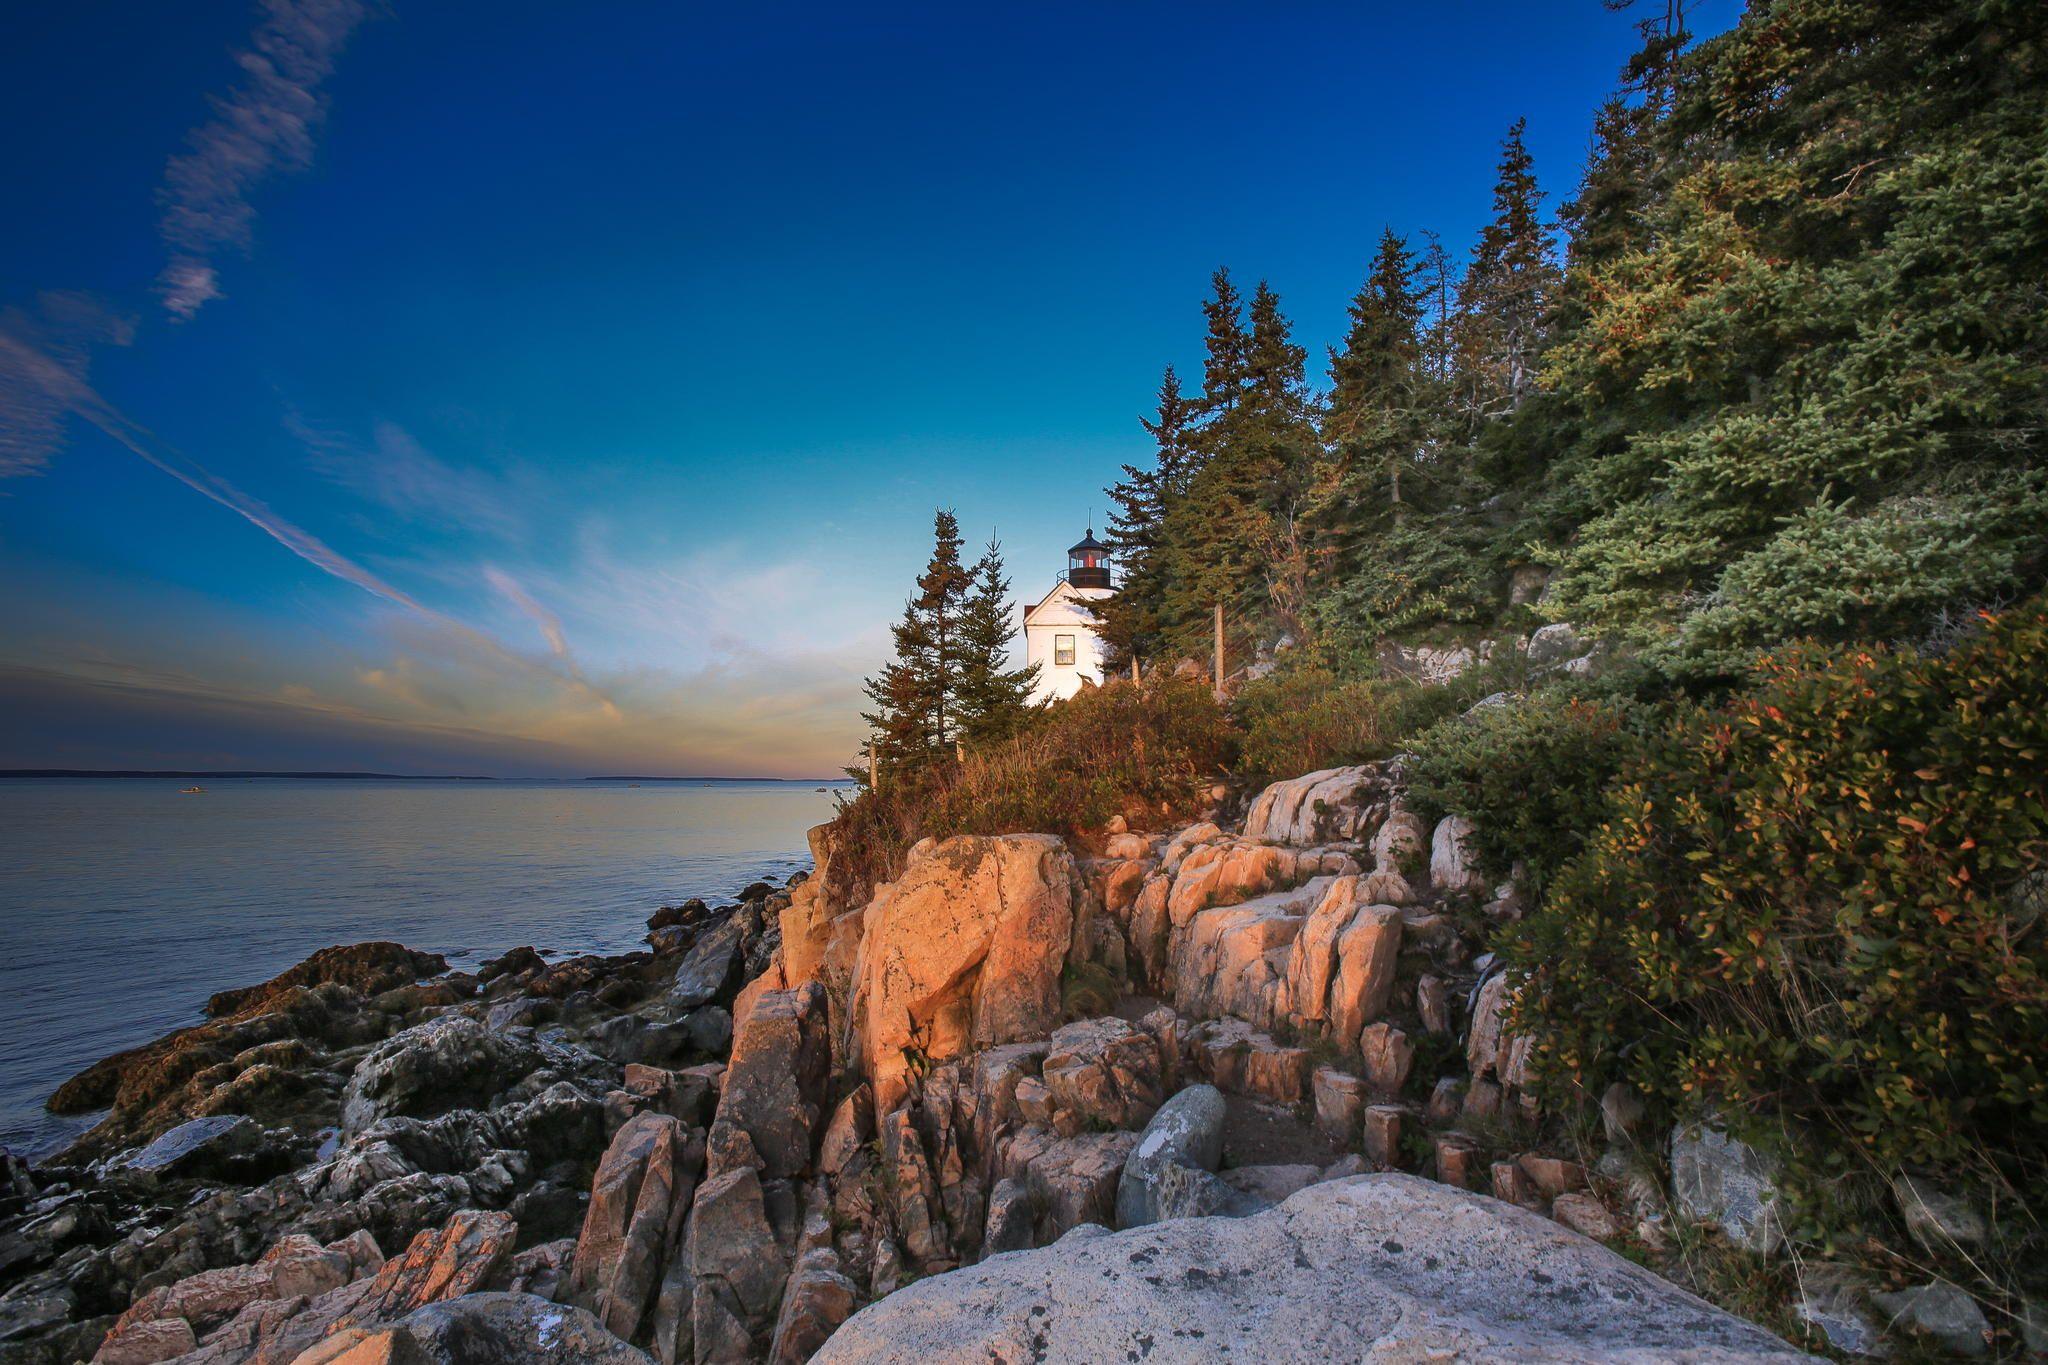 A Maine Morning, Bar Harbor, Maine